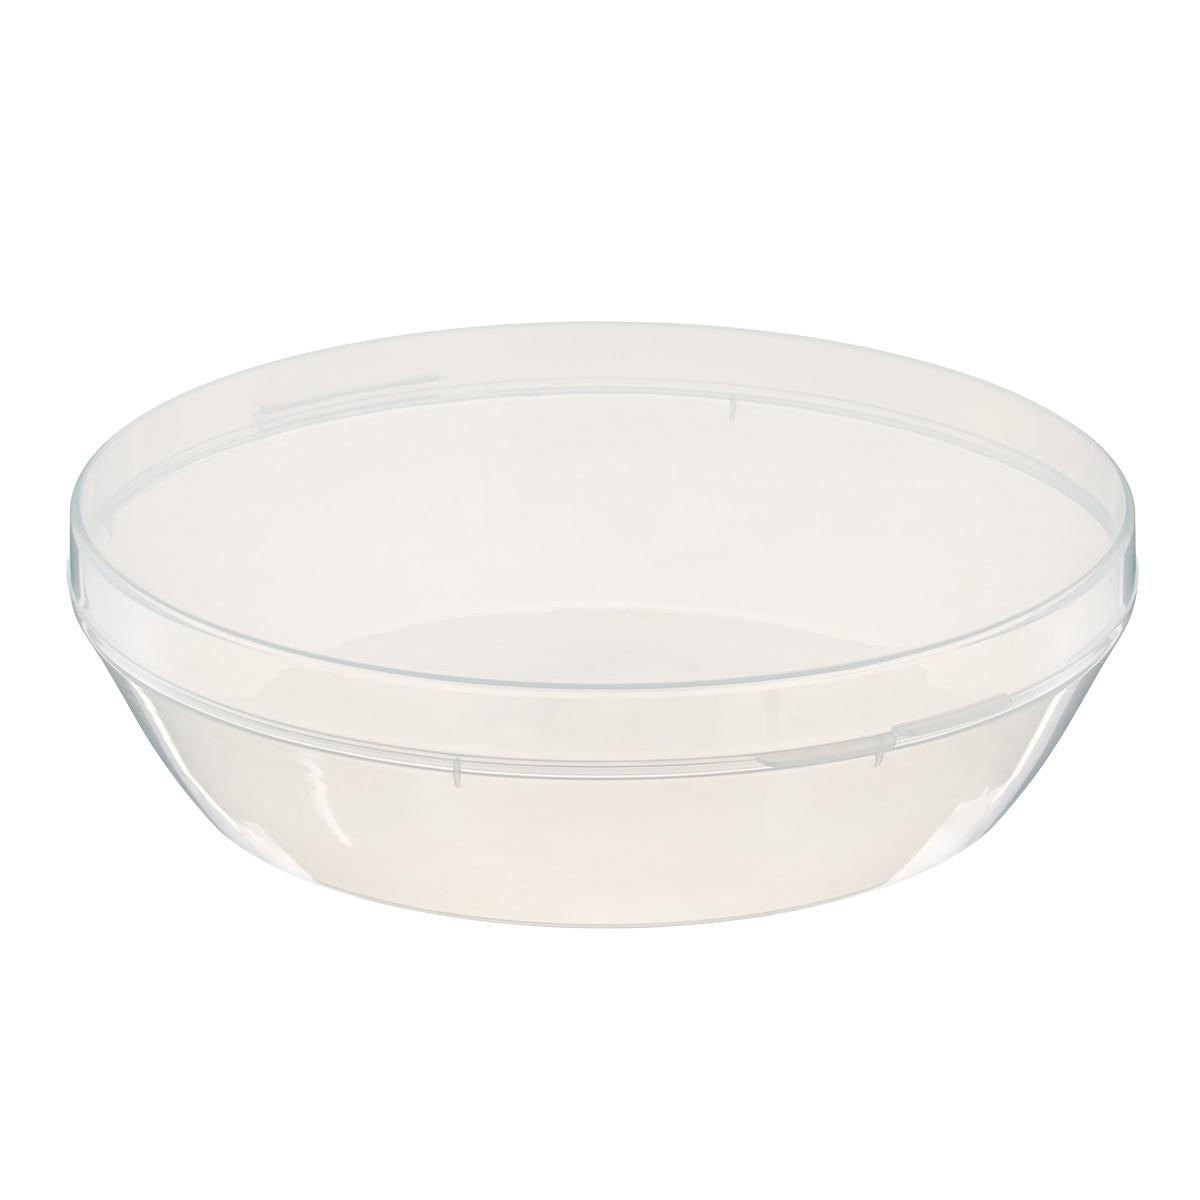 Stay Fresh Pie Keeper